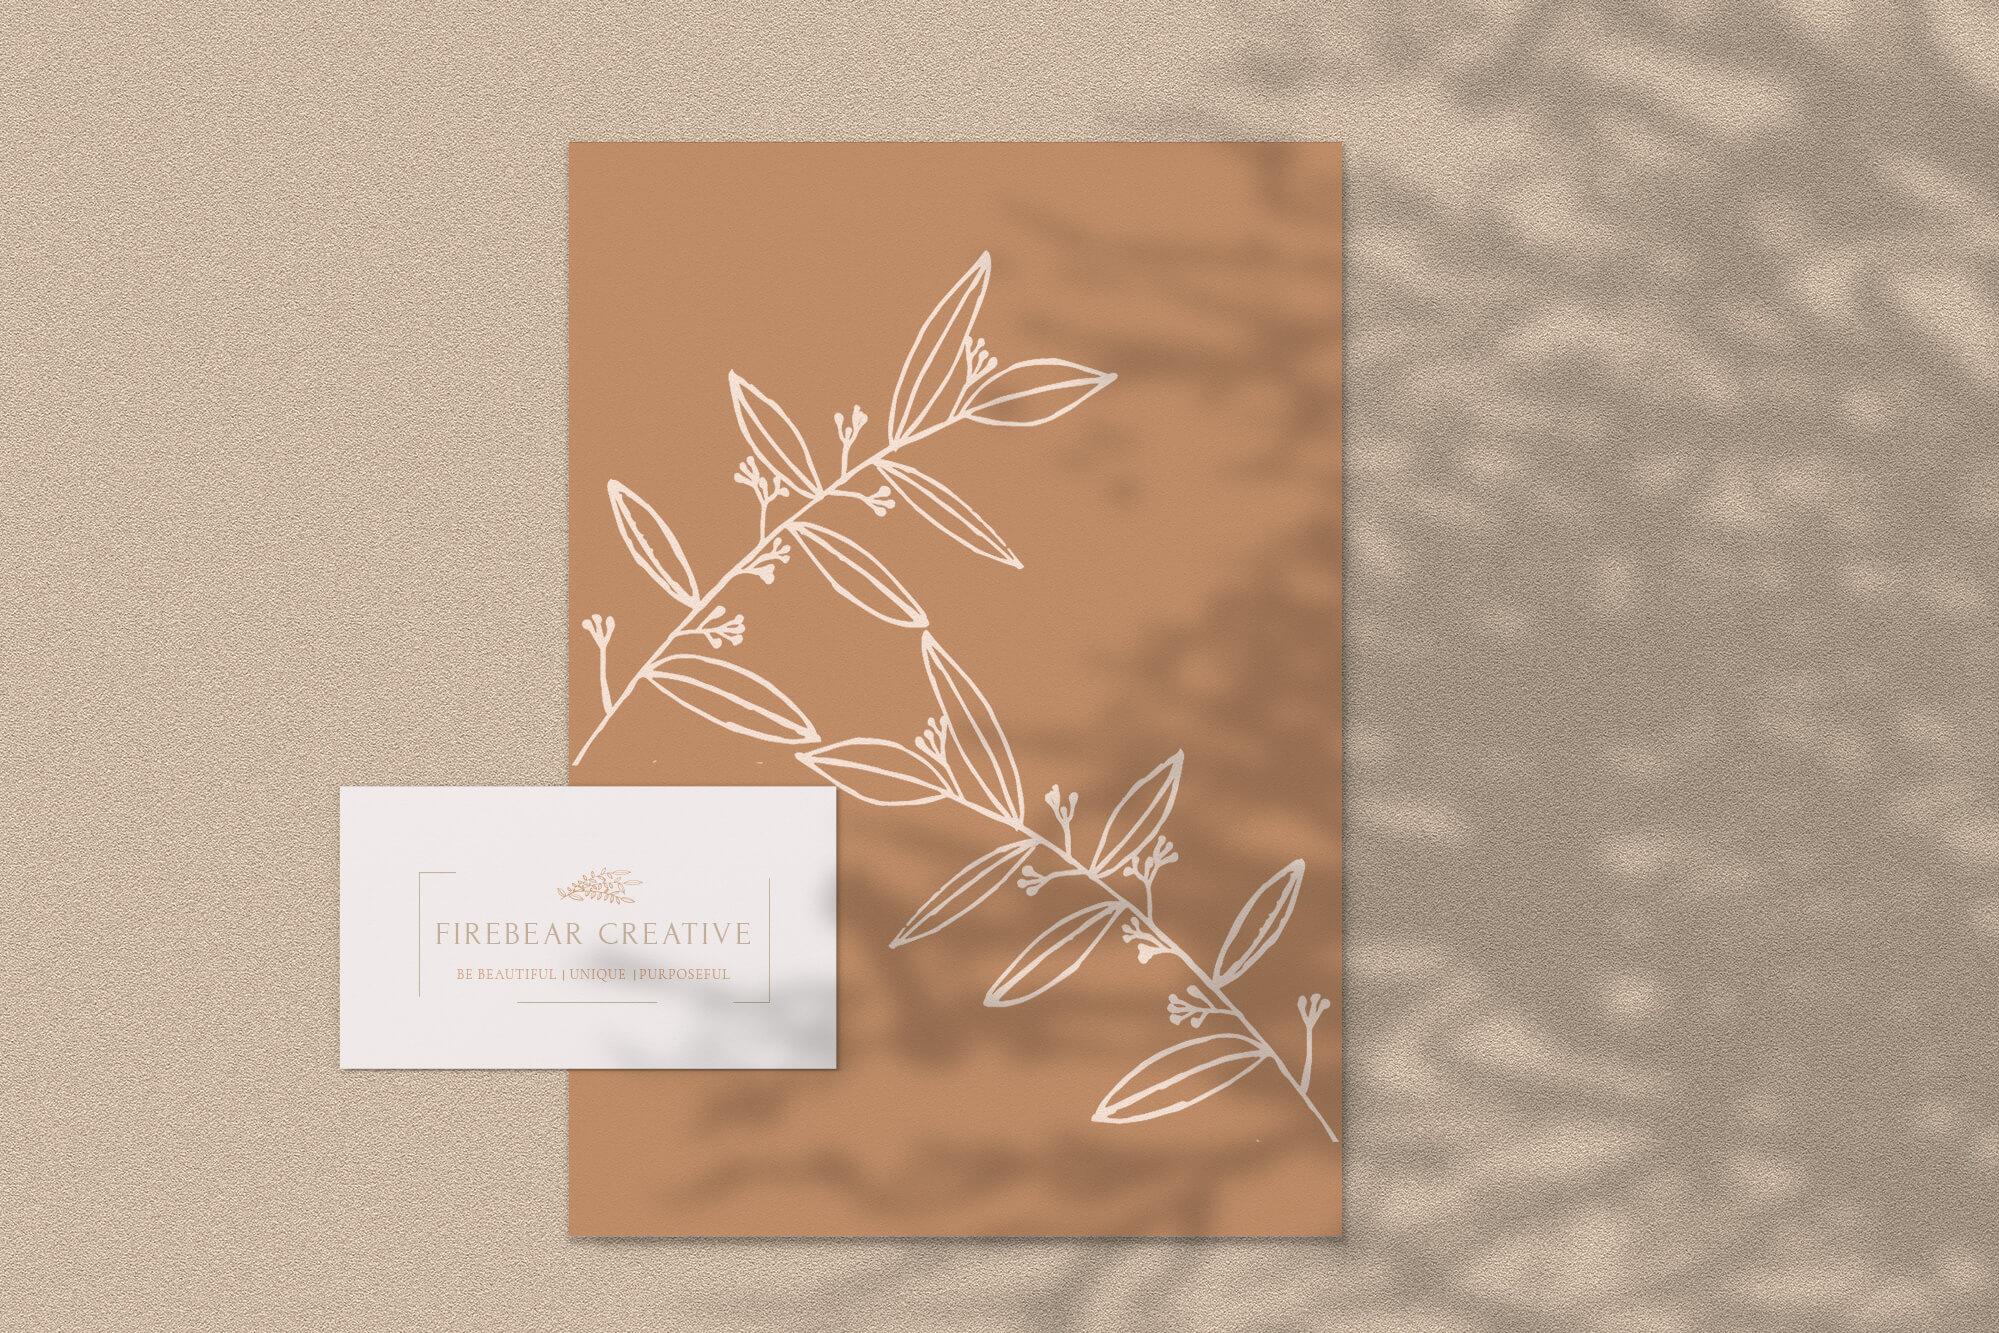 print and logo 2.jpg